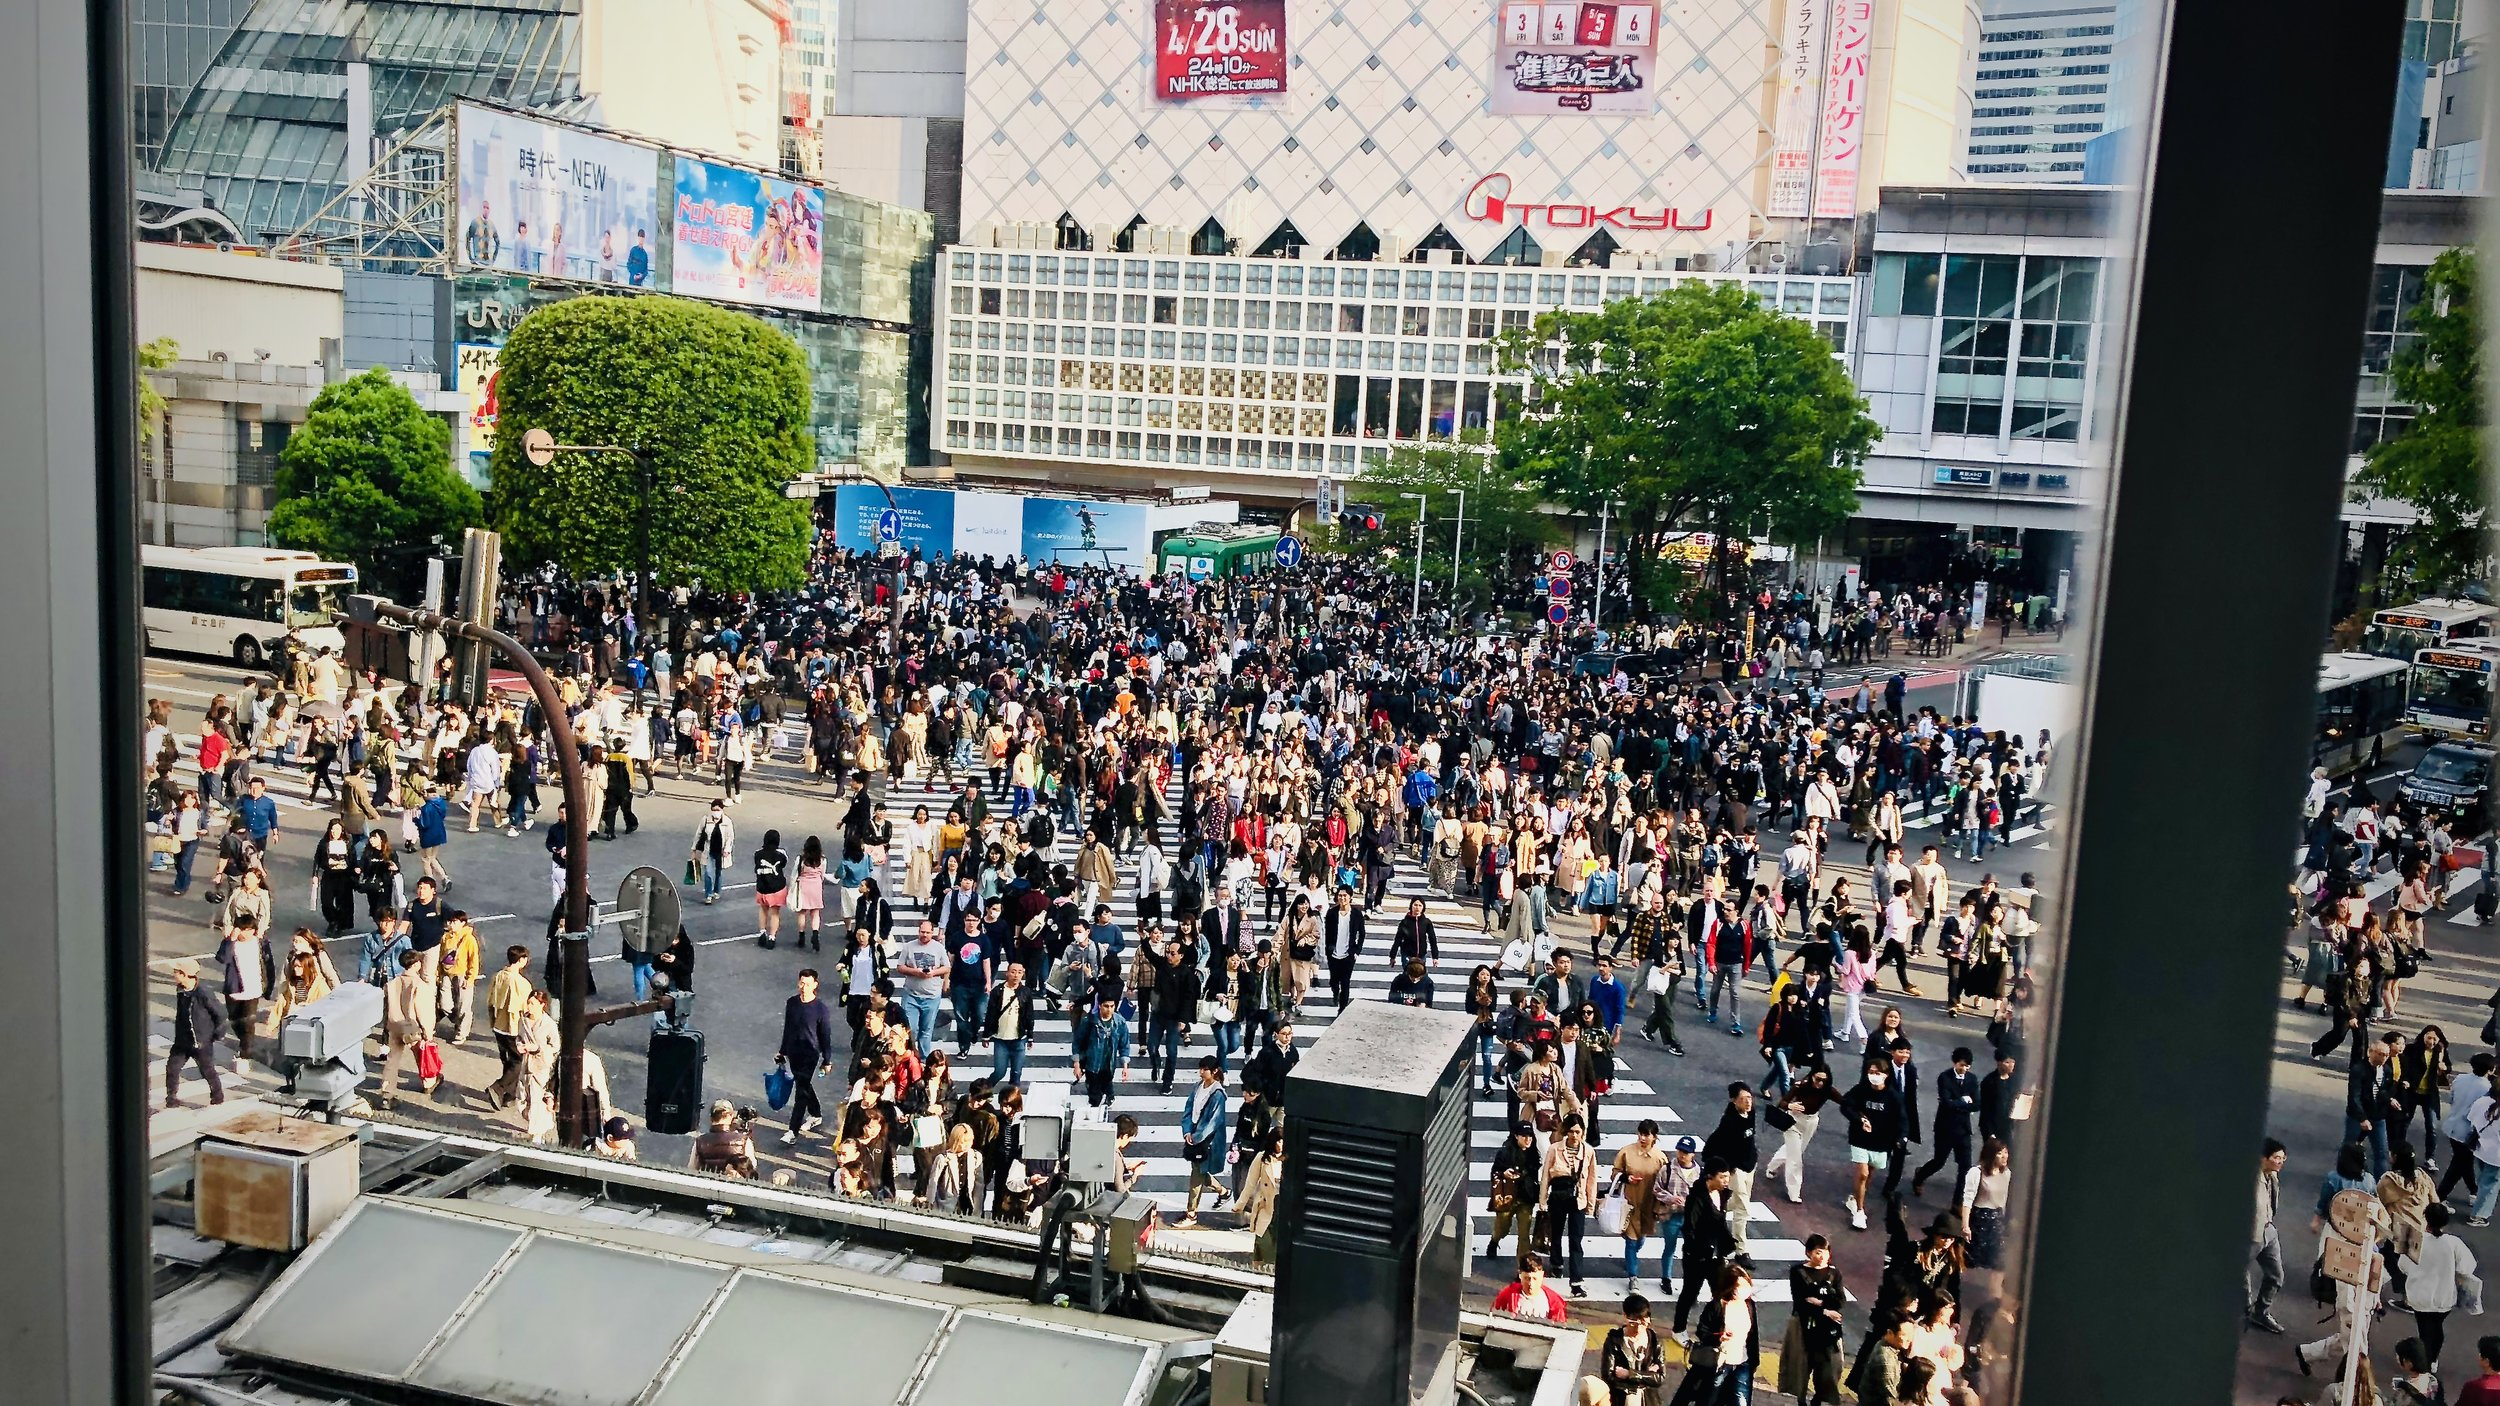 View of Shibuya Crossing from Starbucks.